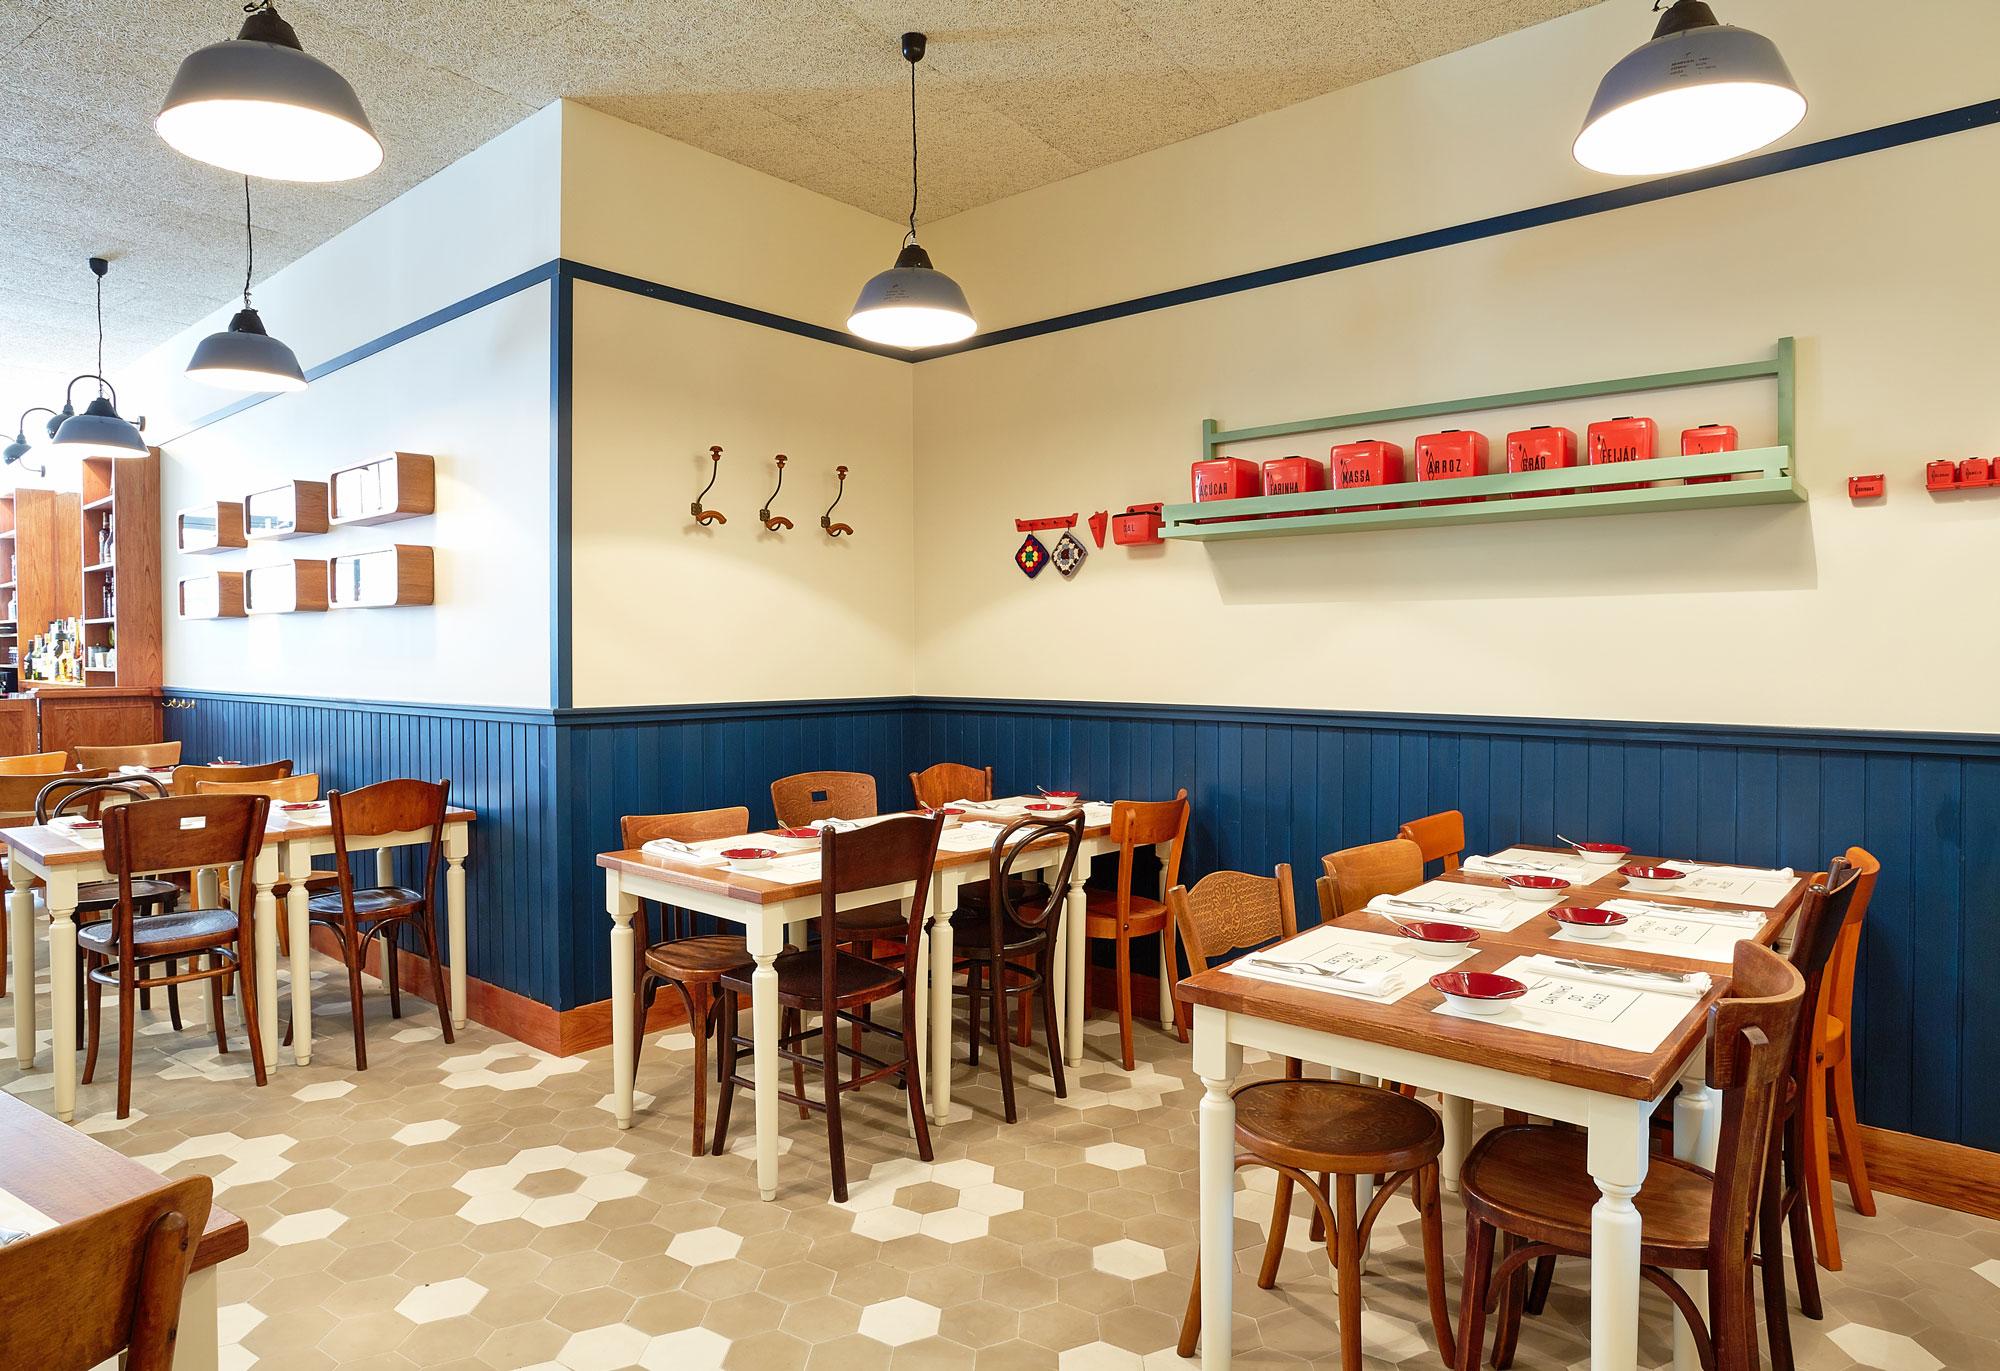 Cantinho do Avillez, Bucket Lists, Porto, Oporto, José Avillez, Cantinho do Avillez Porto, Chef, Chef José Avillez,